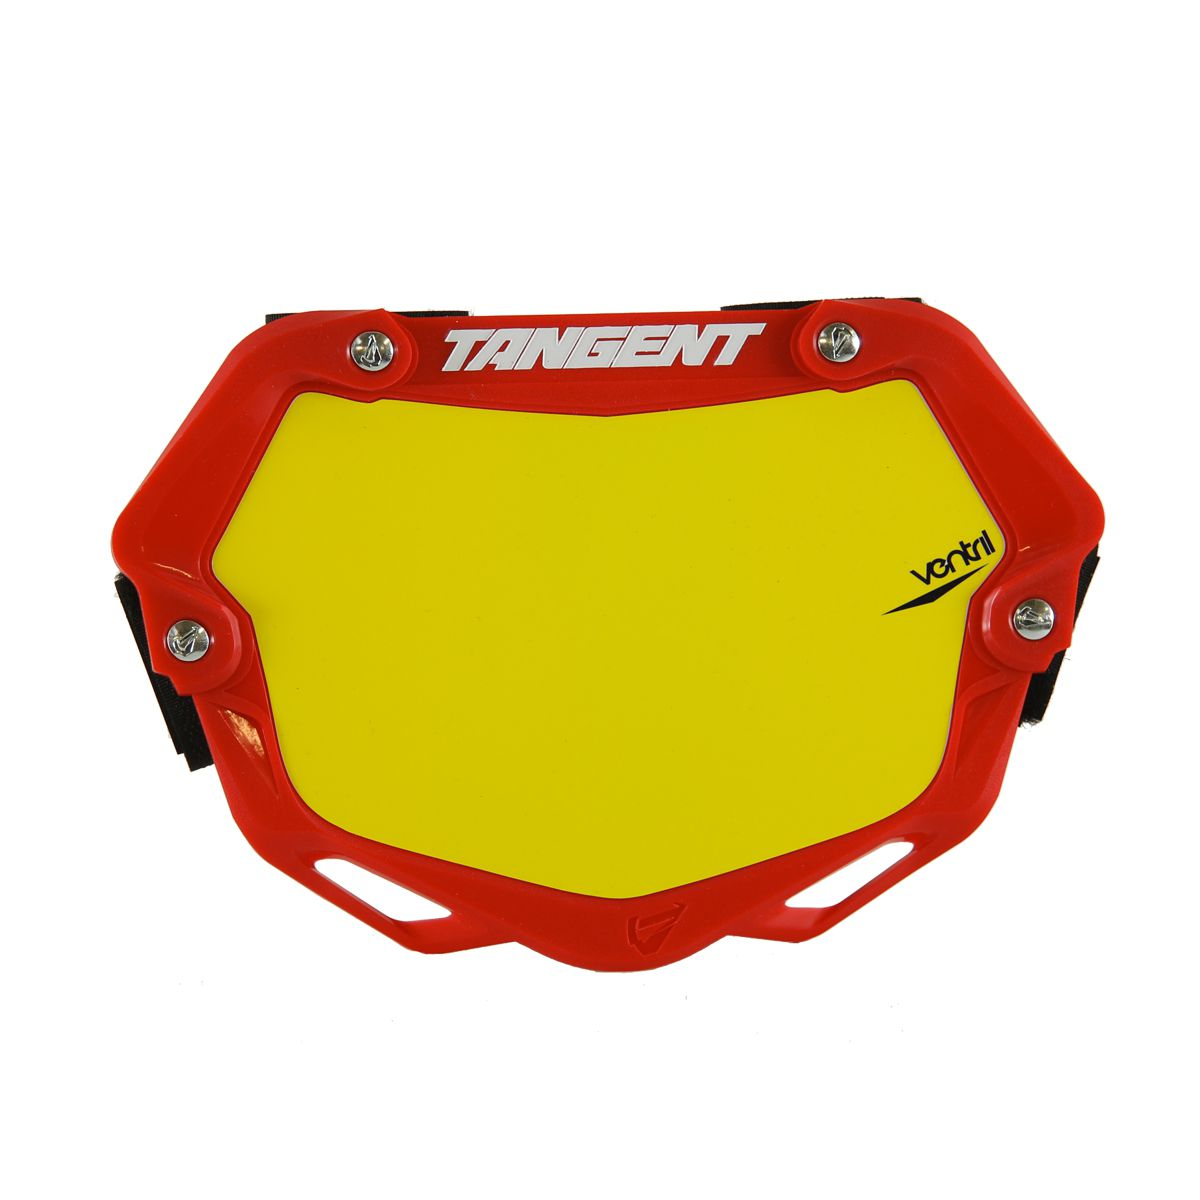 plaque-tangent-ventril-3d-mini-fond-jaune